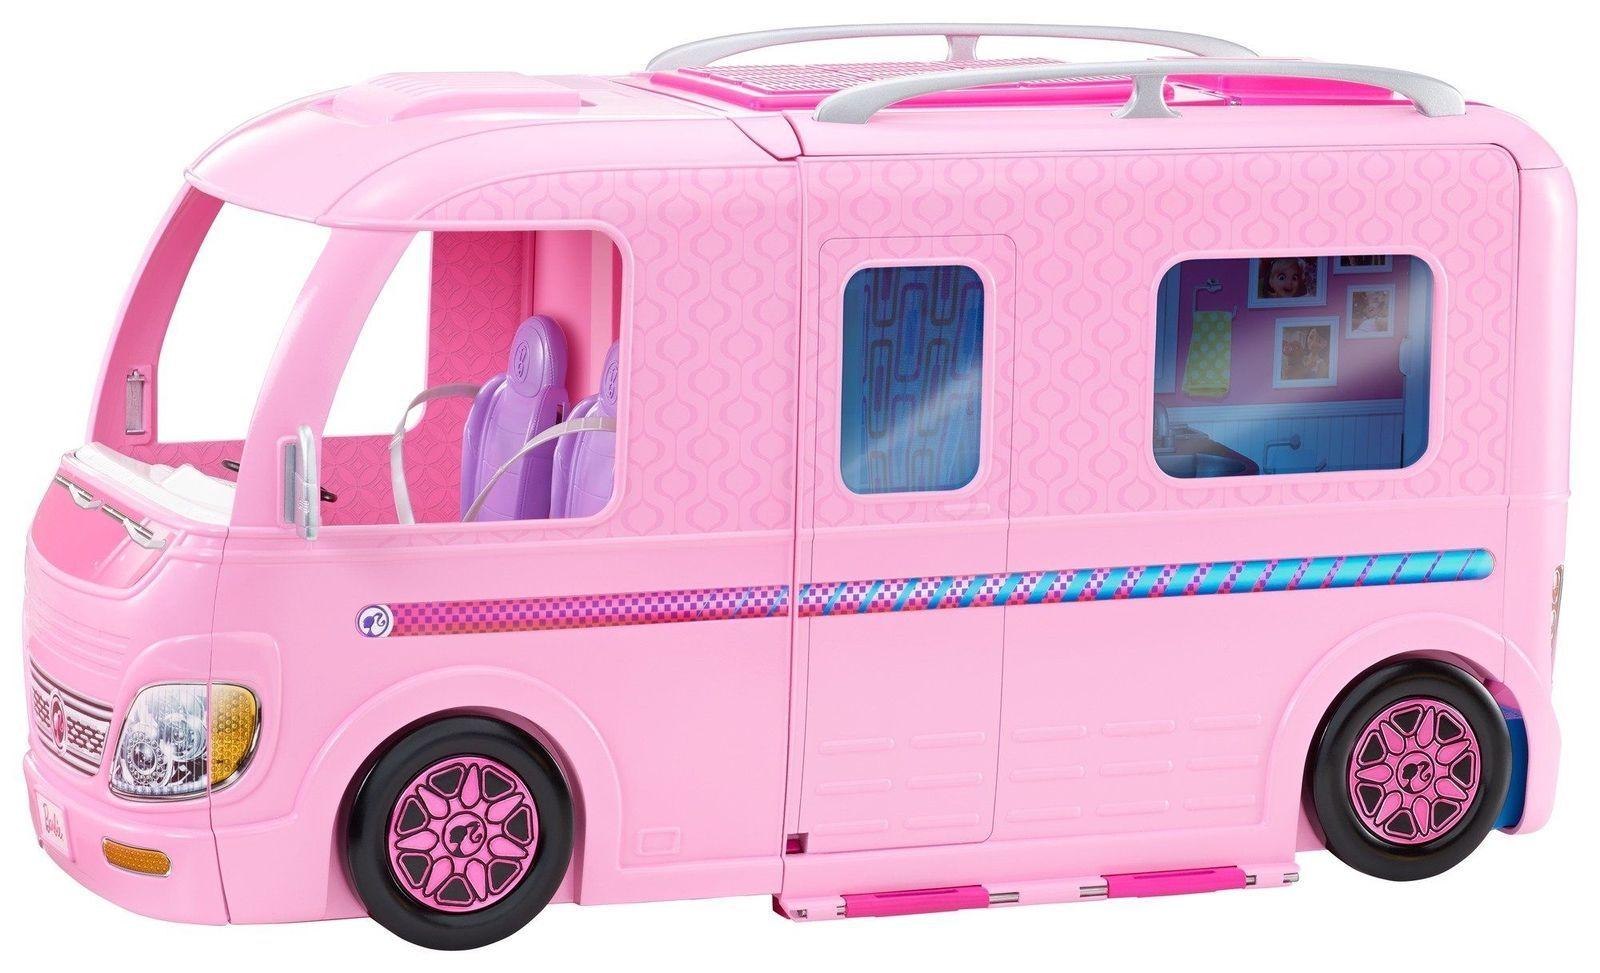 Barbie Camper House RV Pool Car Vehicle Furniture Accessories Dream Playset